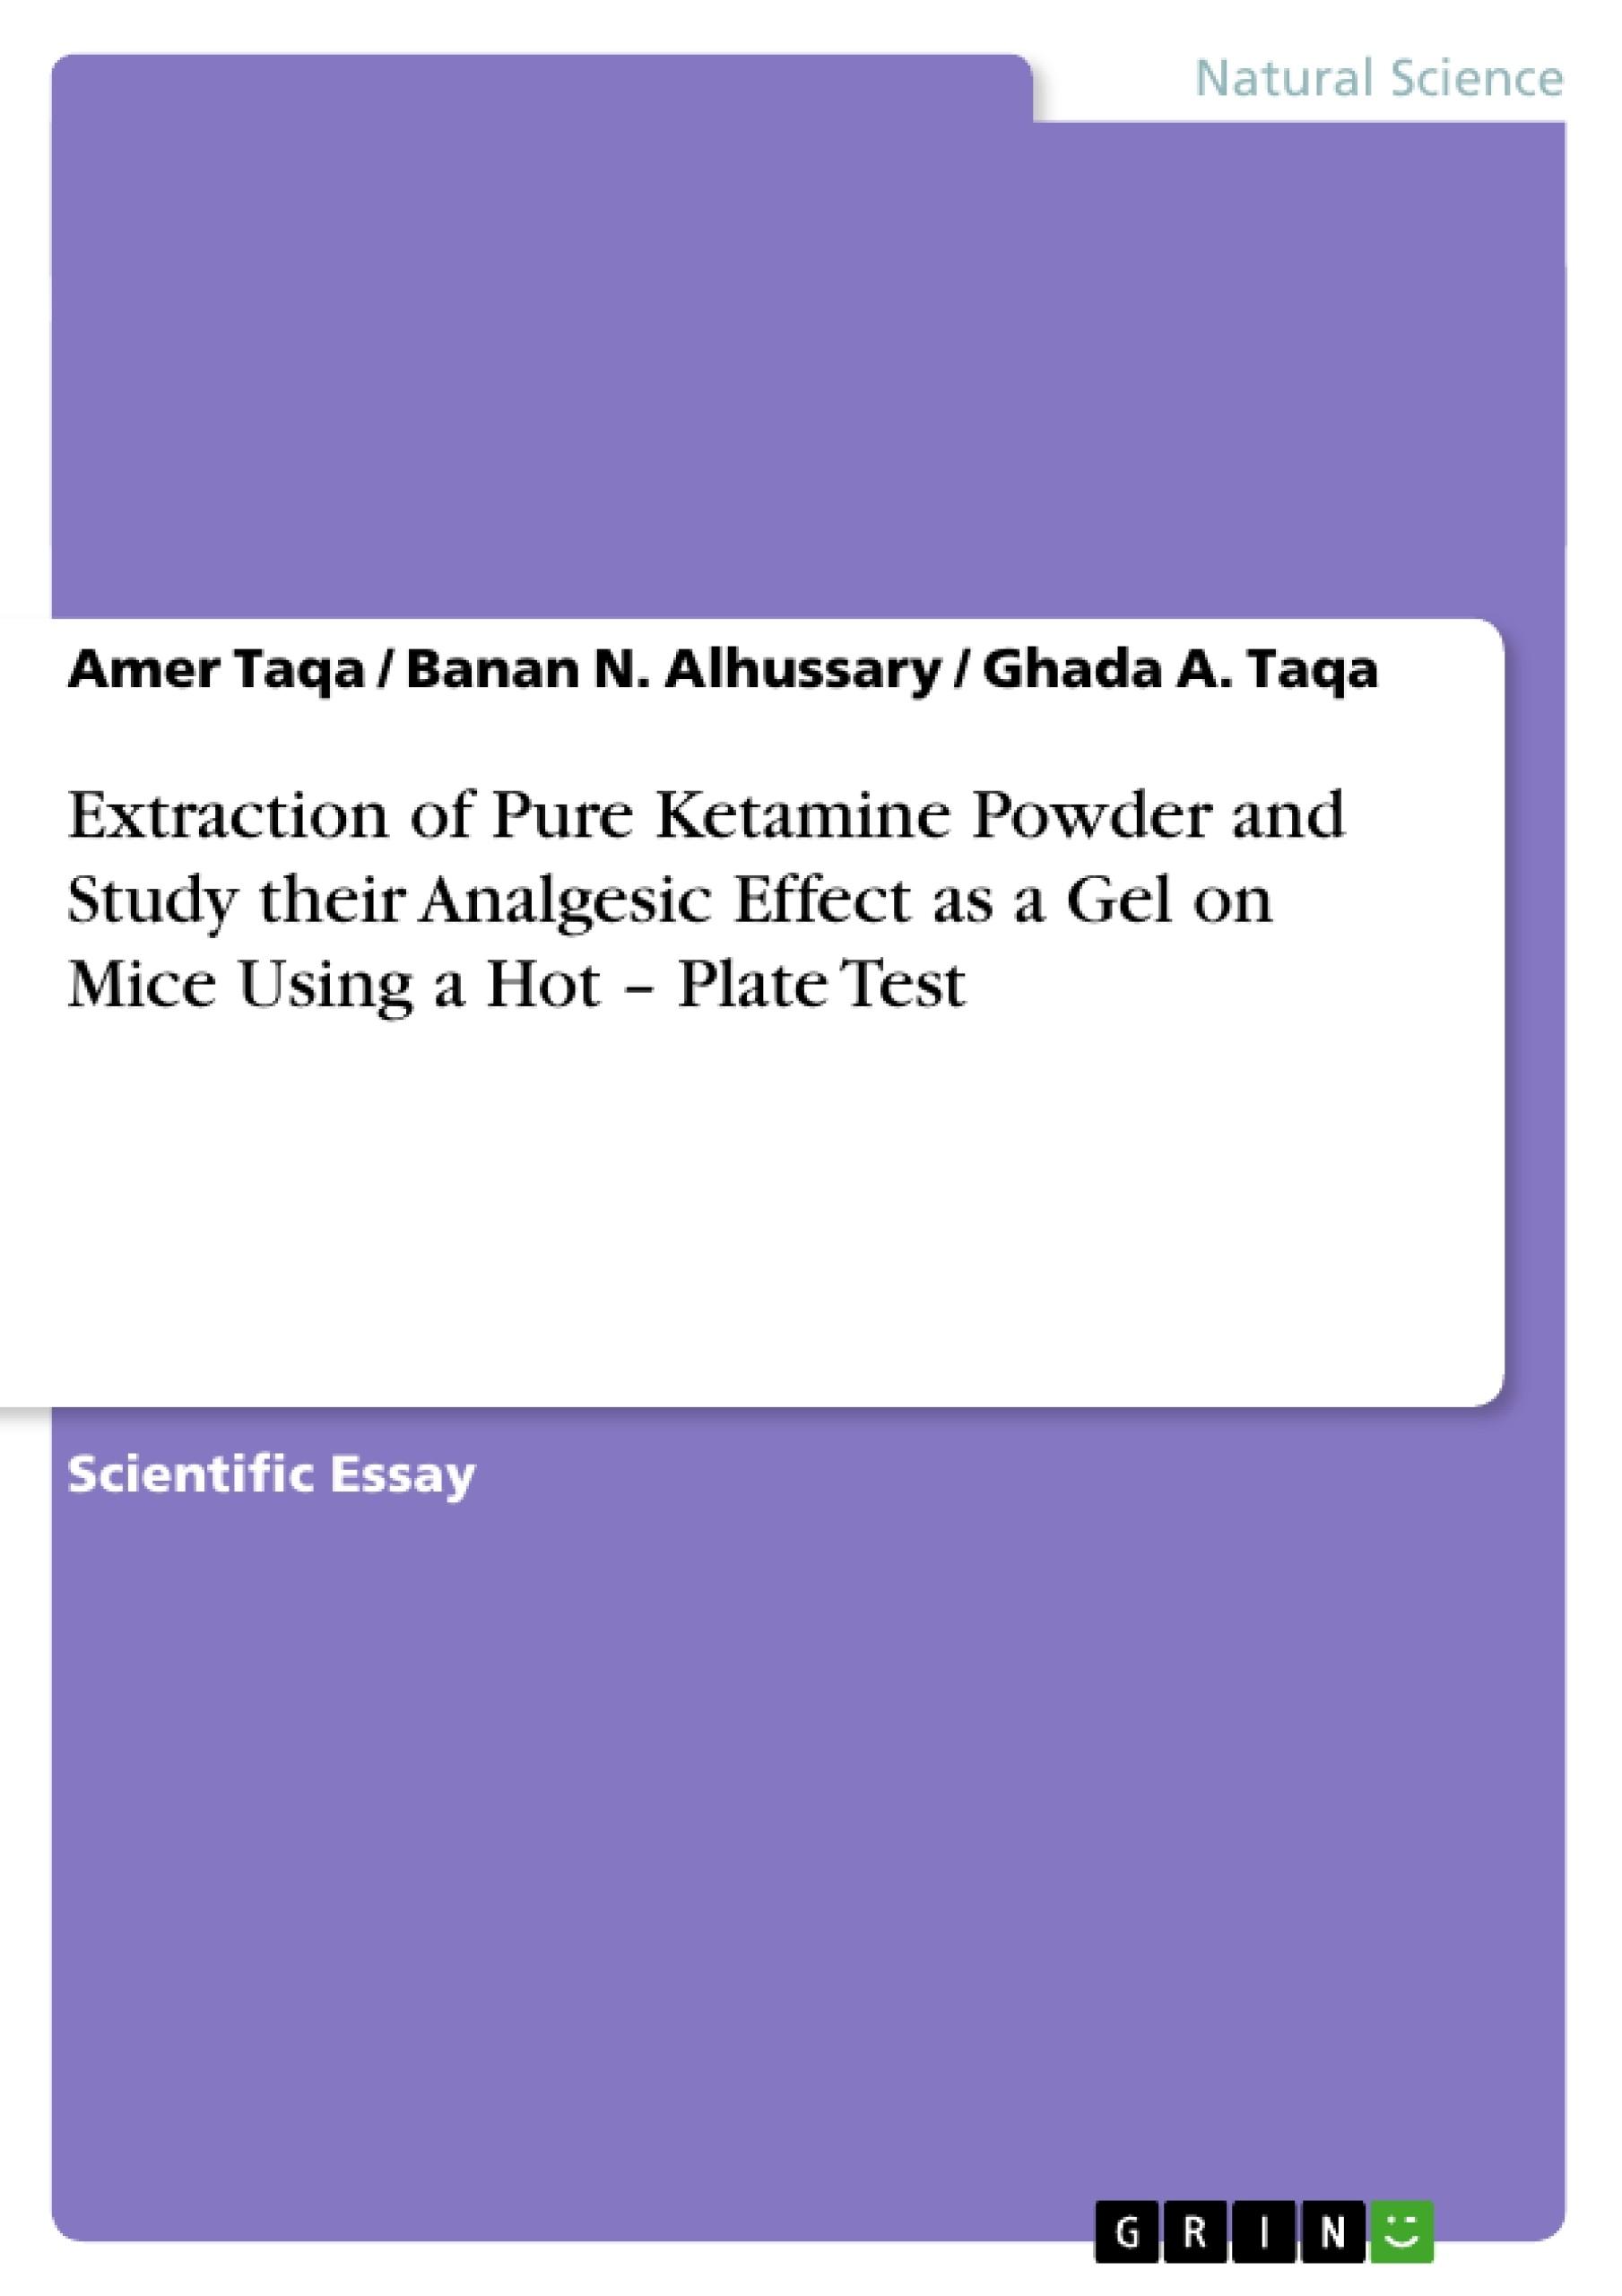 Dissertation awareness under general anesthesia